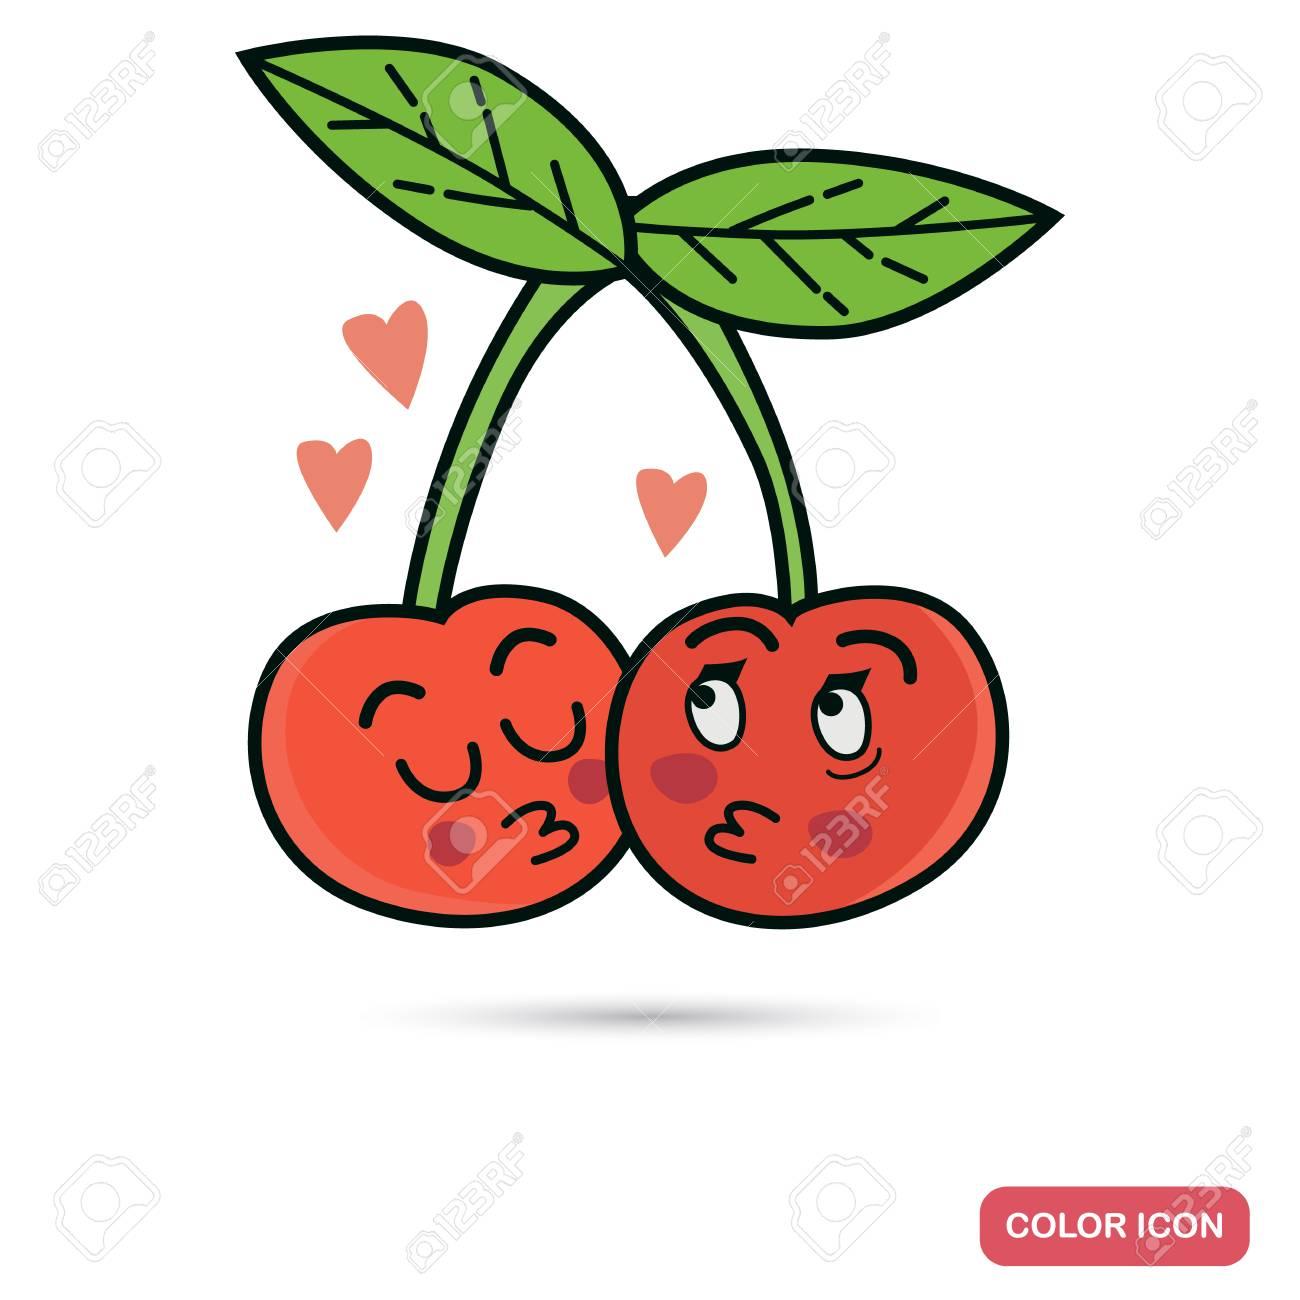 Cherry chat com